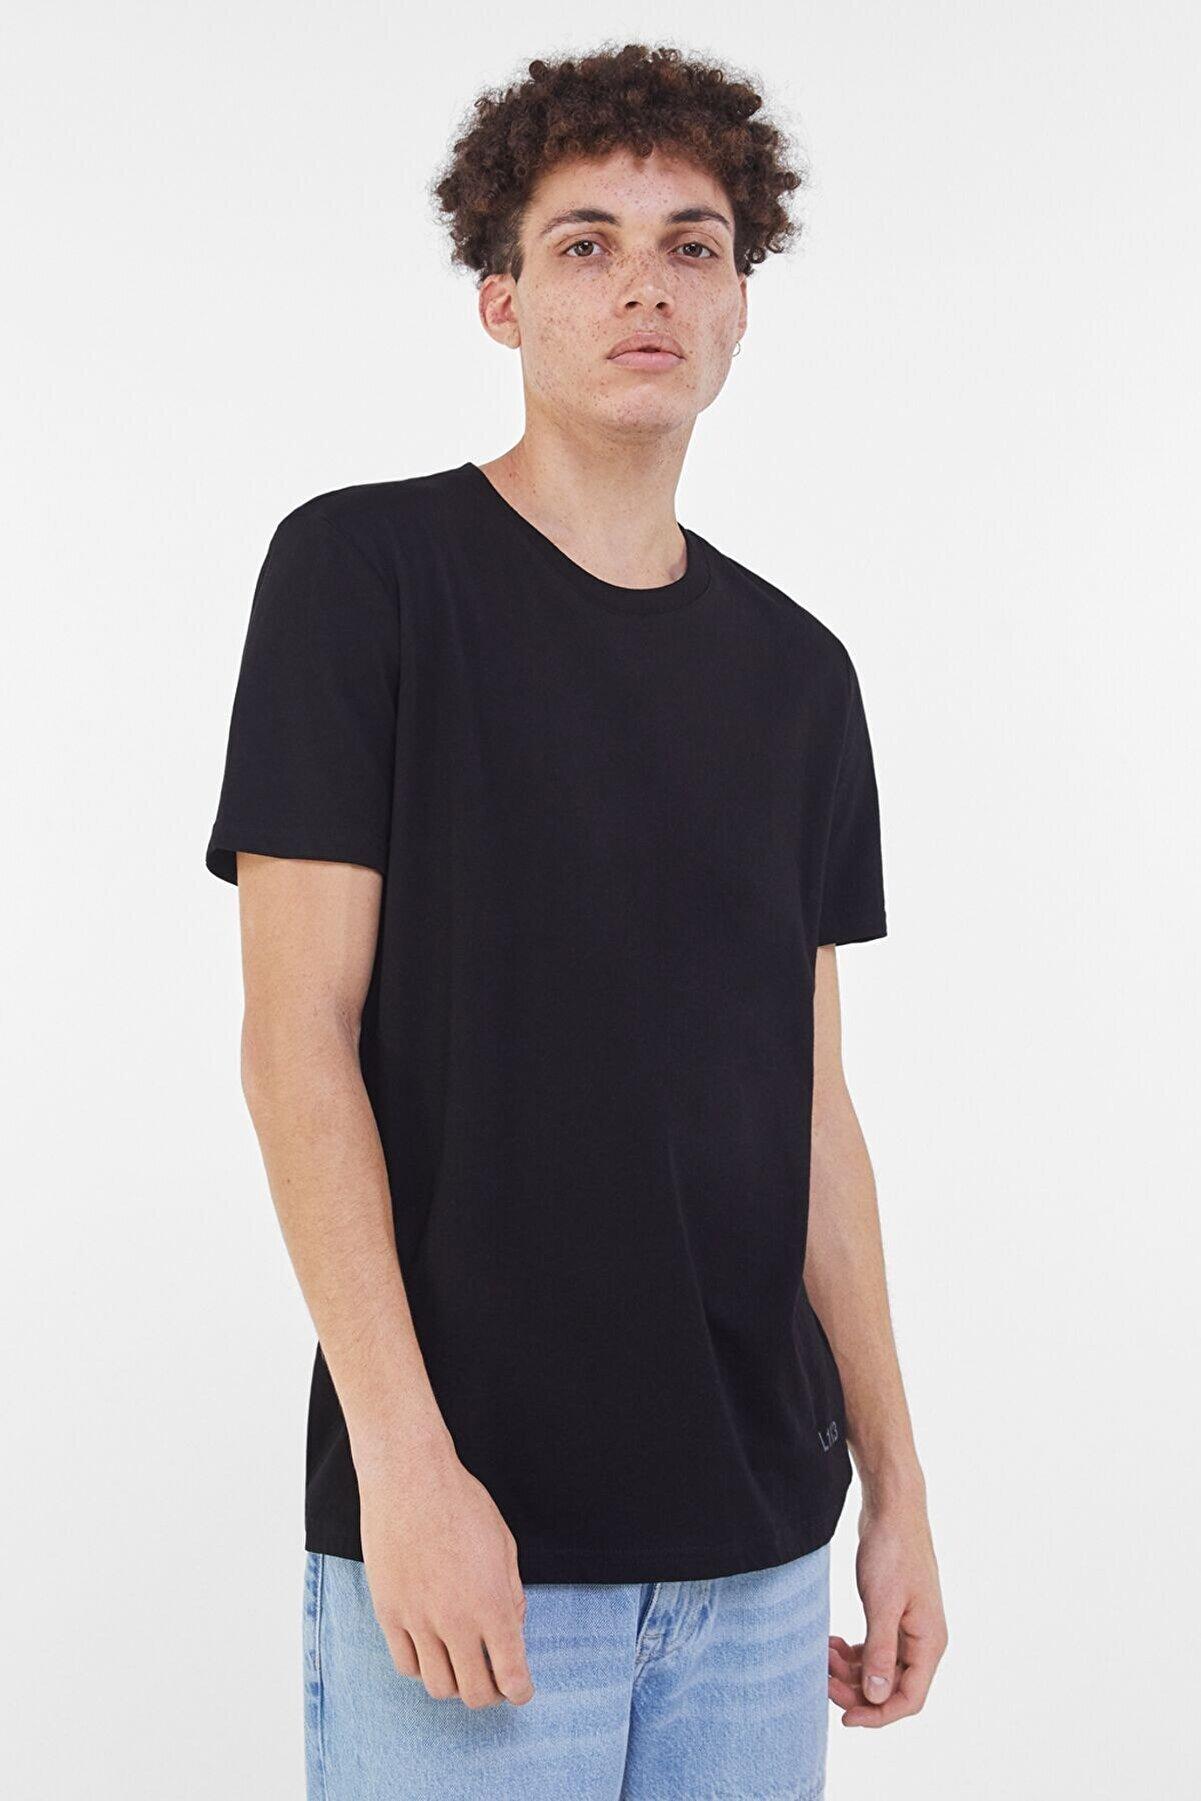 Bershka Erkek Siyah Normal Kalıp Tişört 02368901